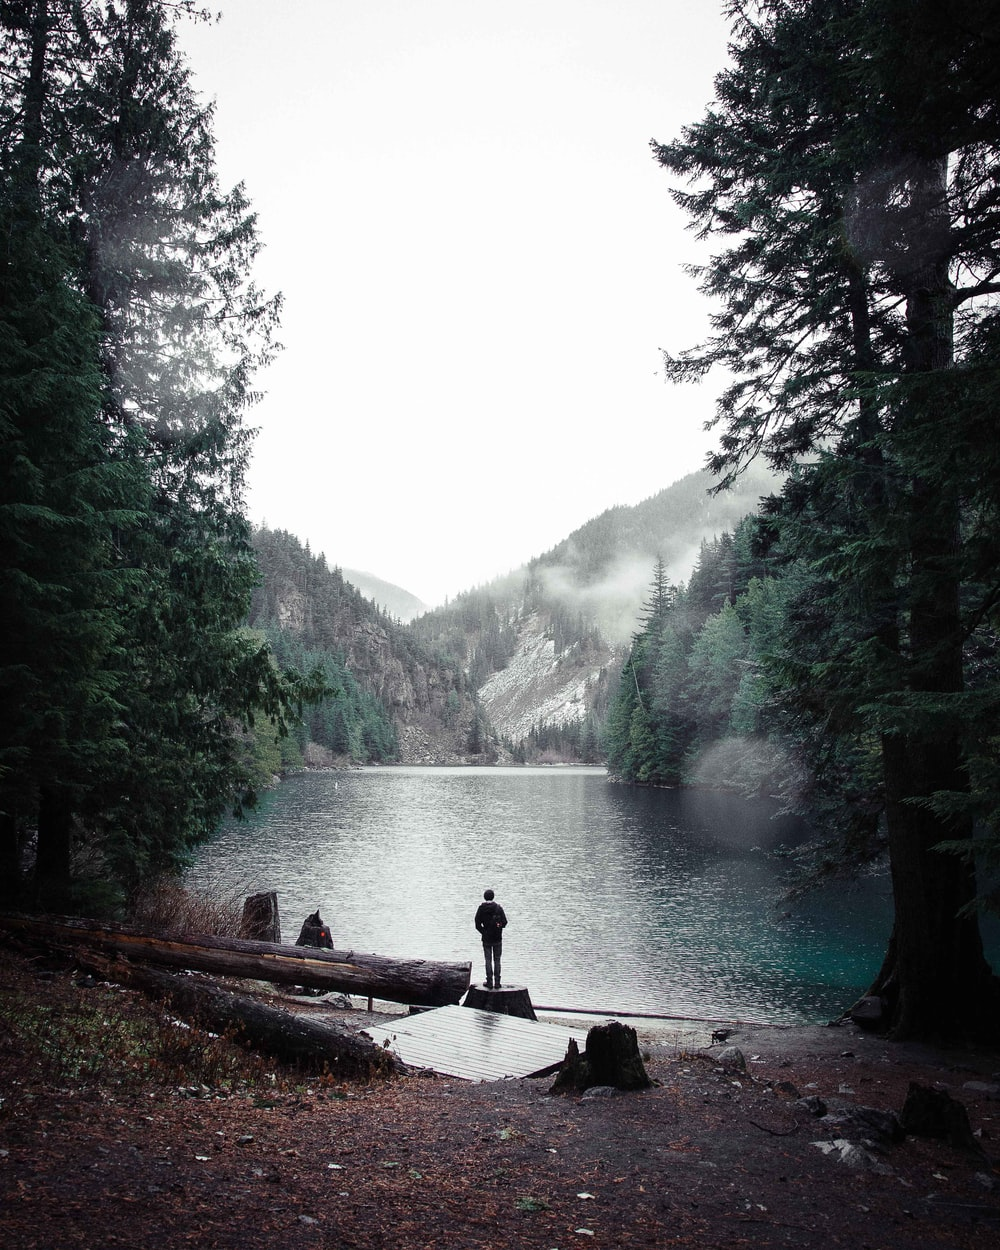 man standing on wood near mountain range